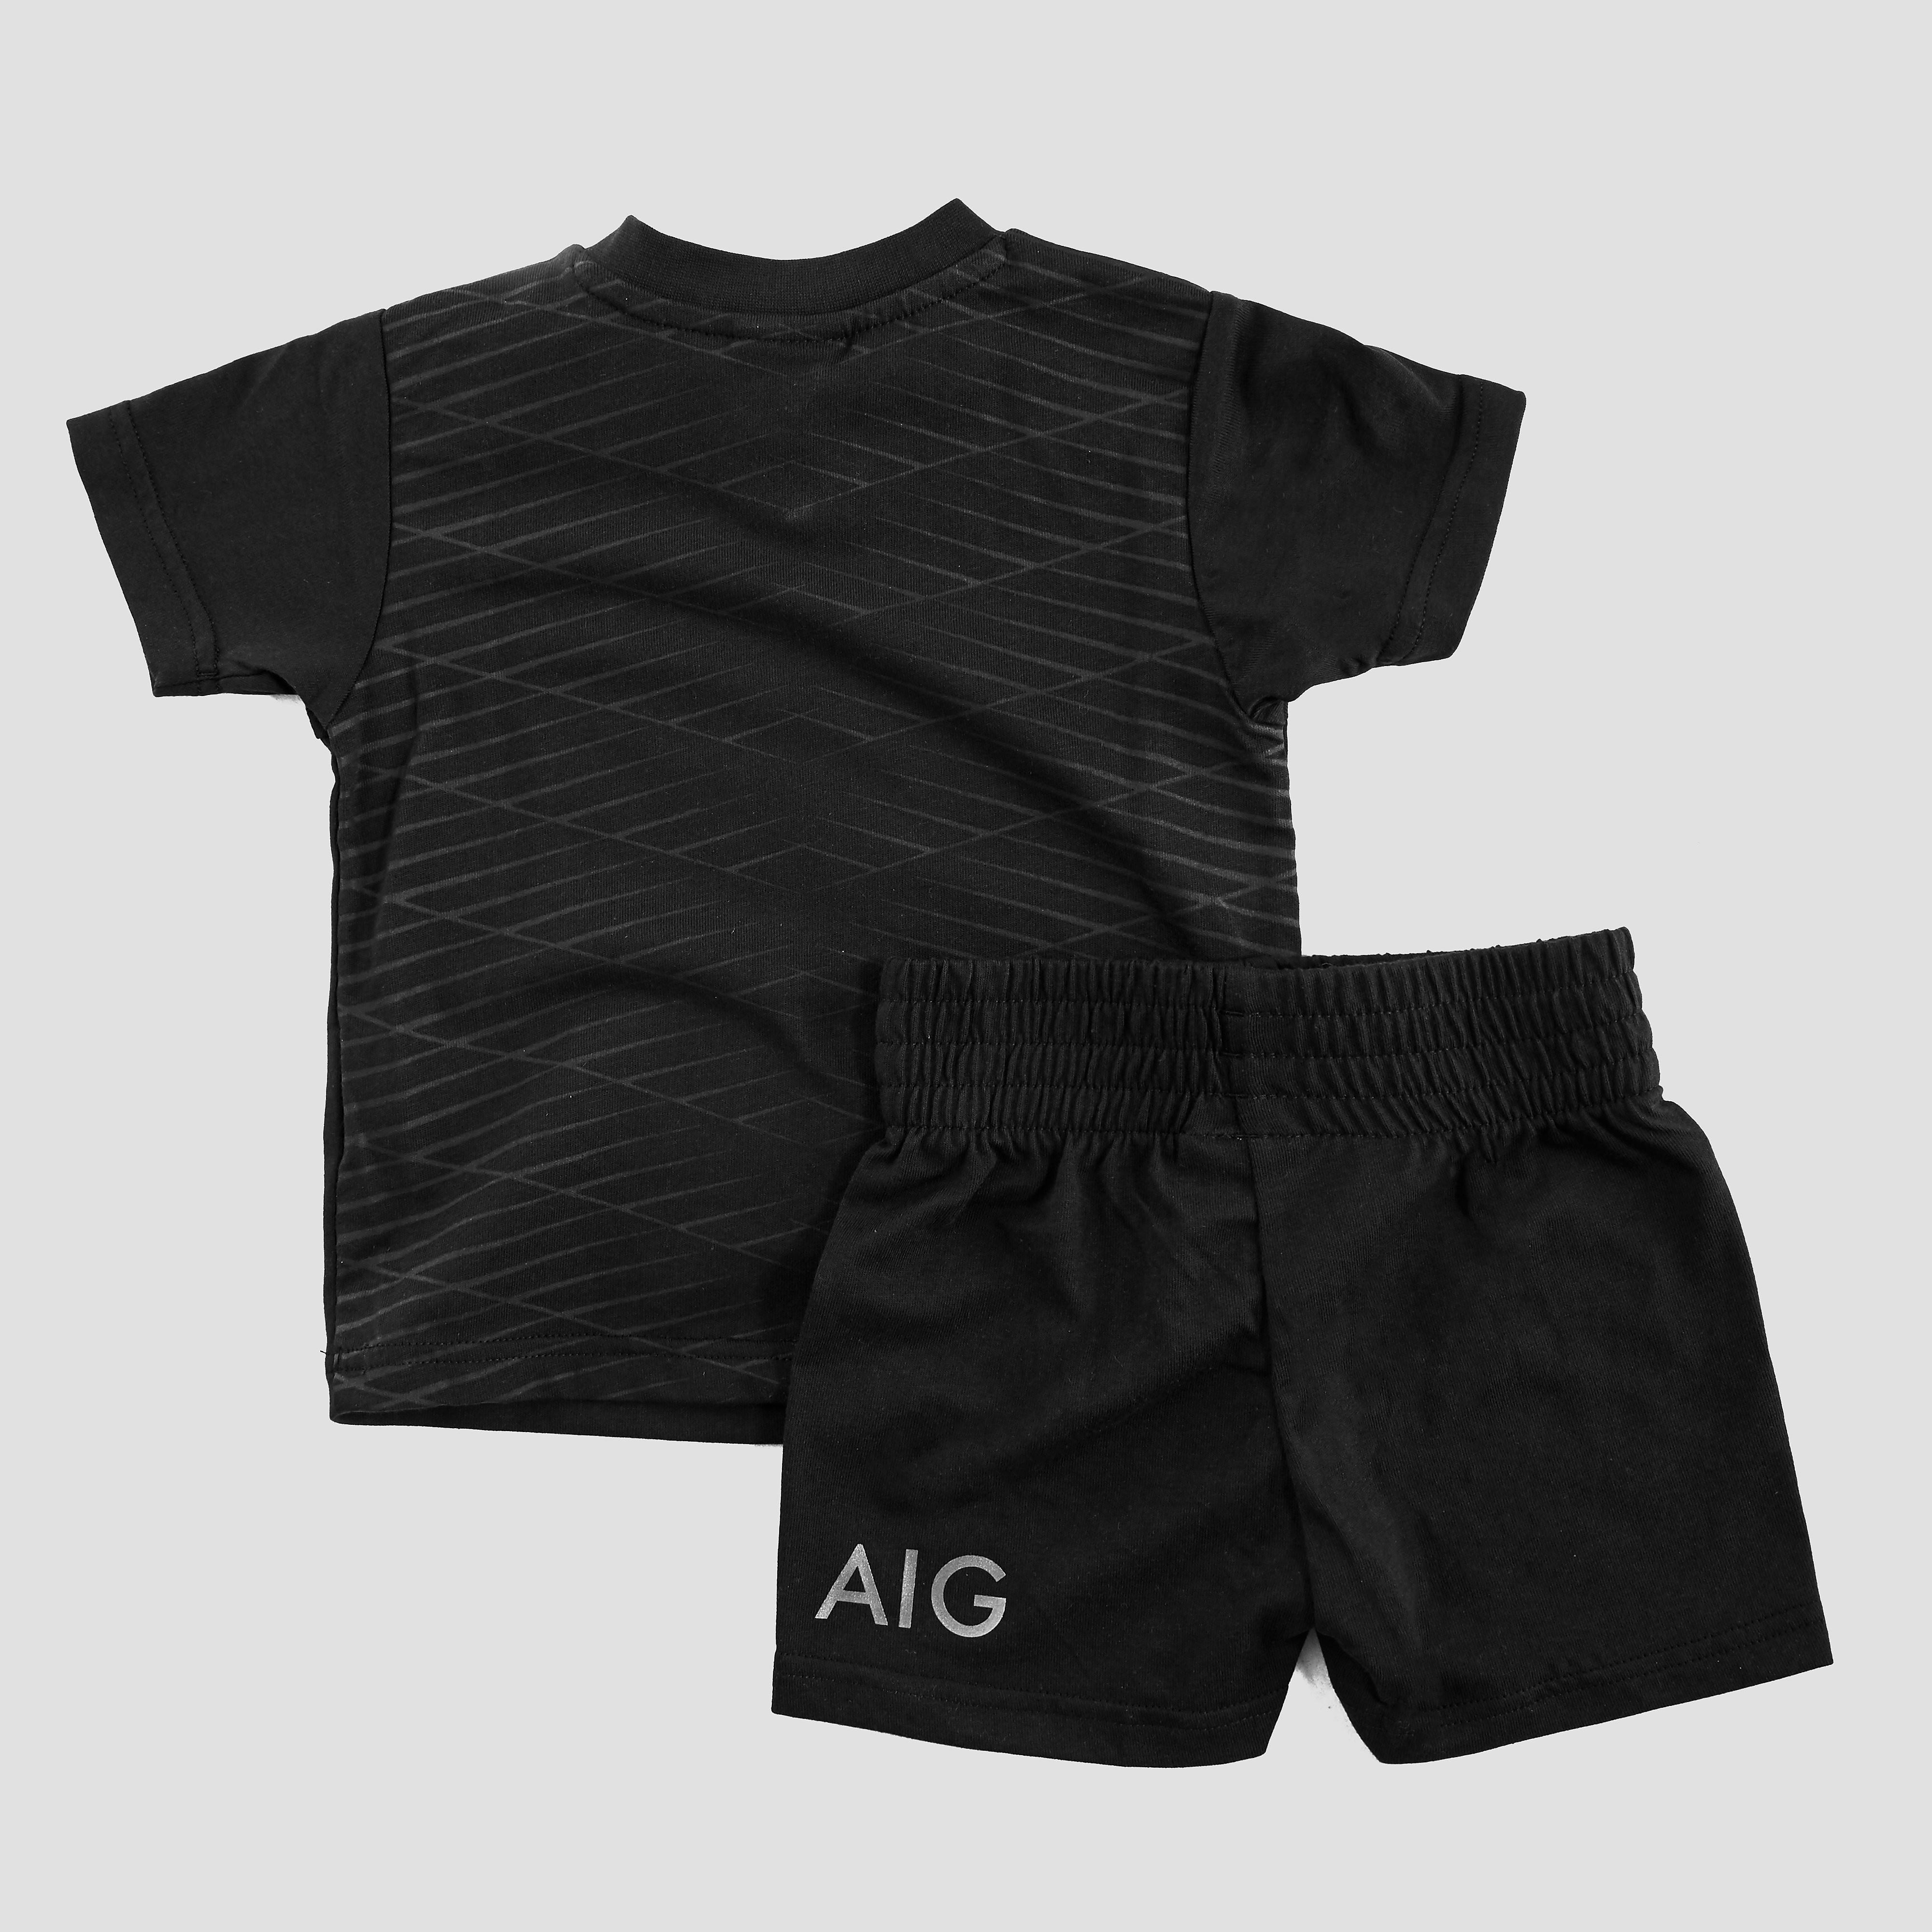 adidas All Blacks 2017 Mini Home Kit